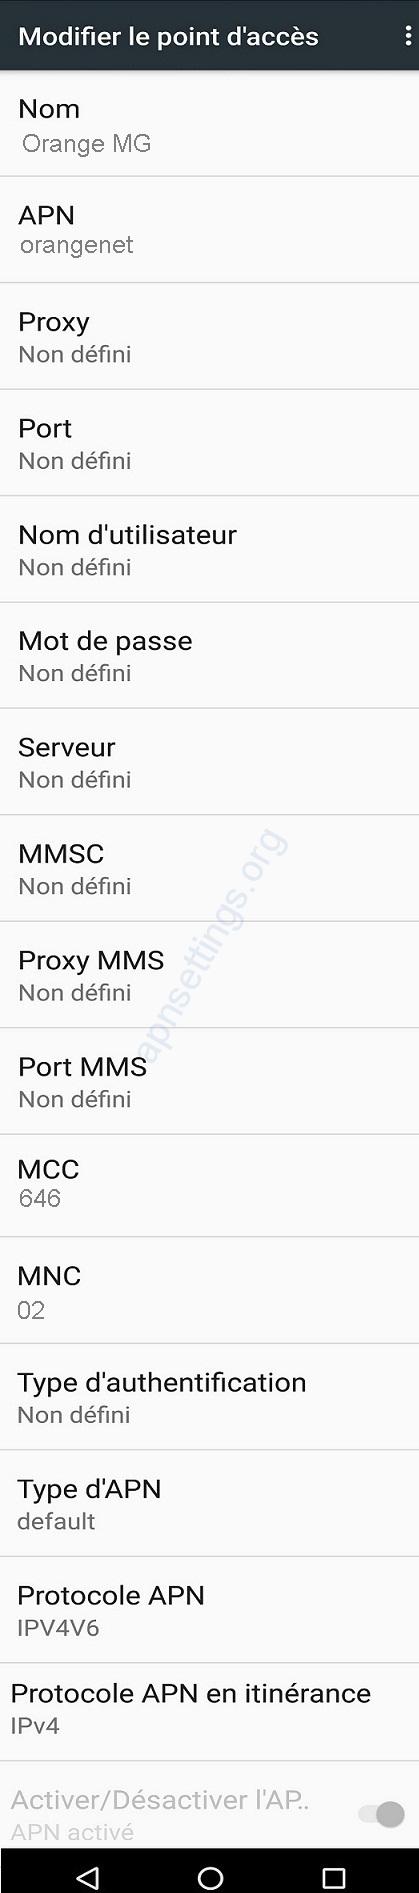 Configuration internet 4G de Orange Madagascar